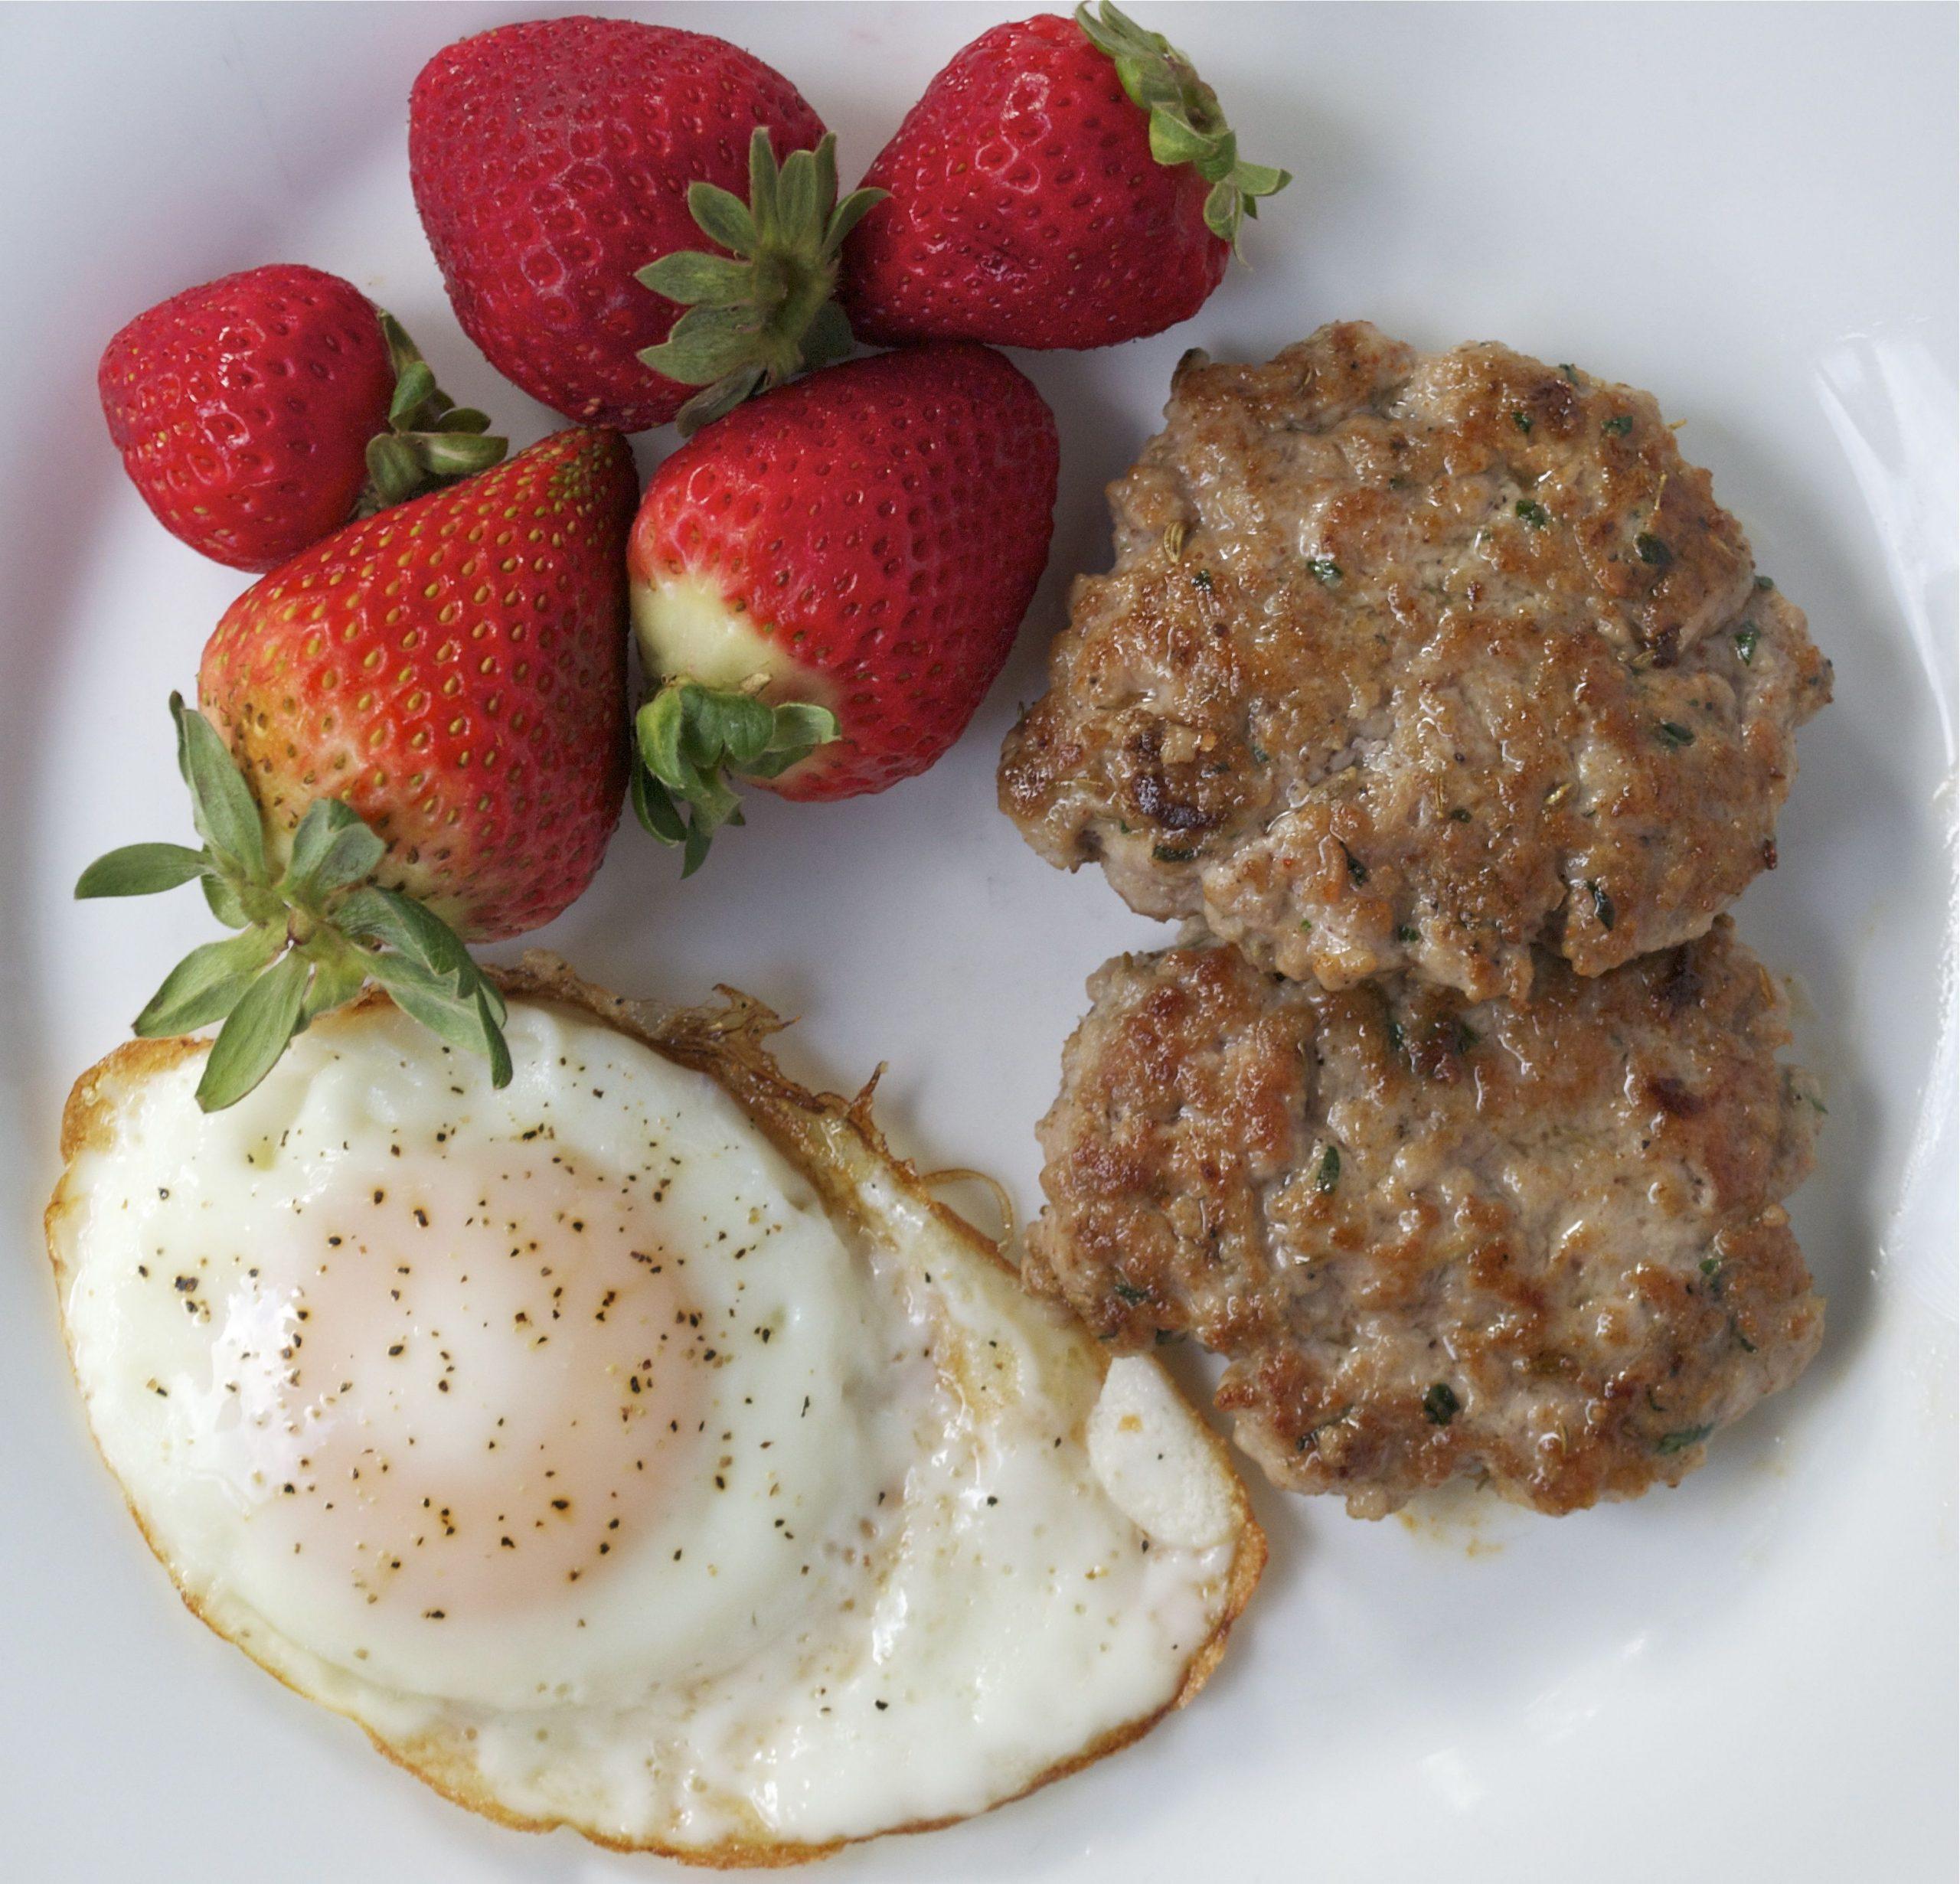 Pork Breakfast Sausage Patties (GF, DF, SF) | A Dash of Megnut